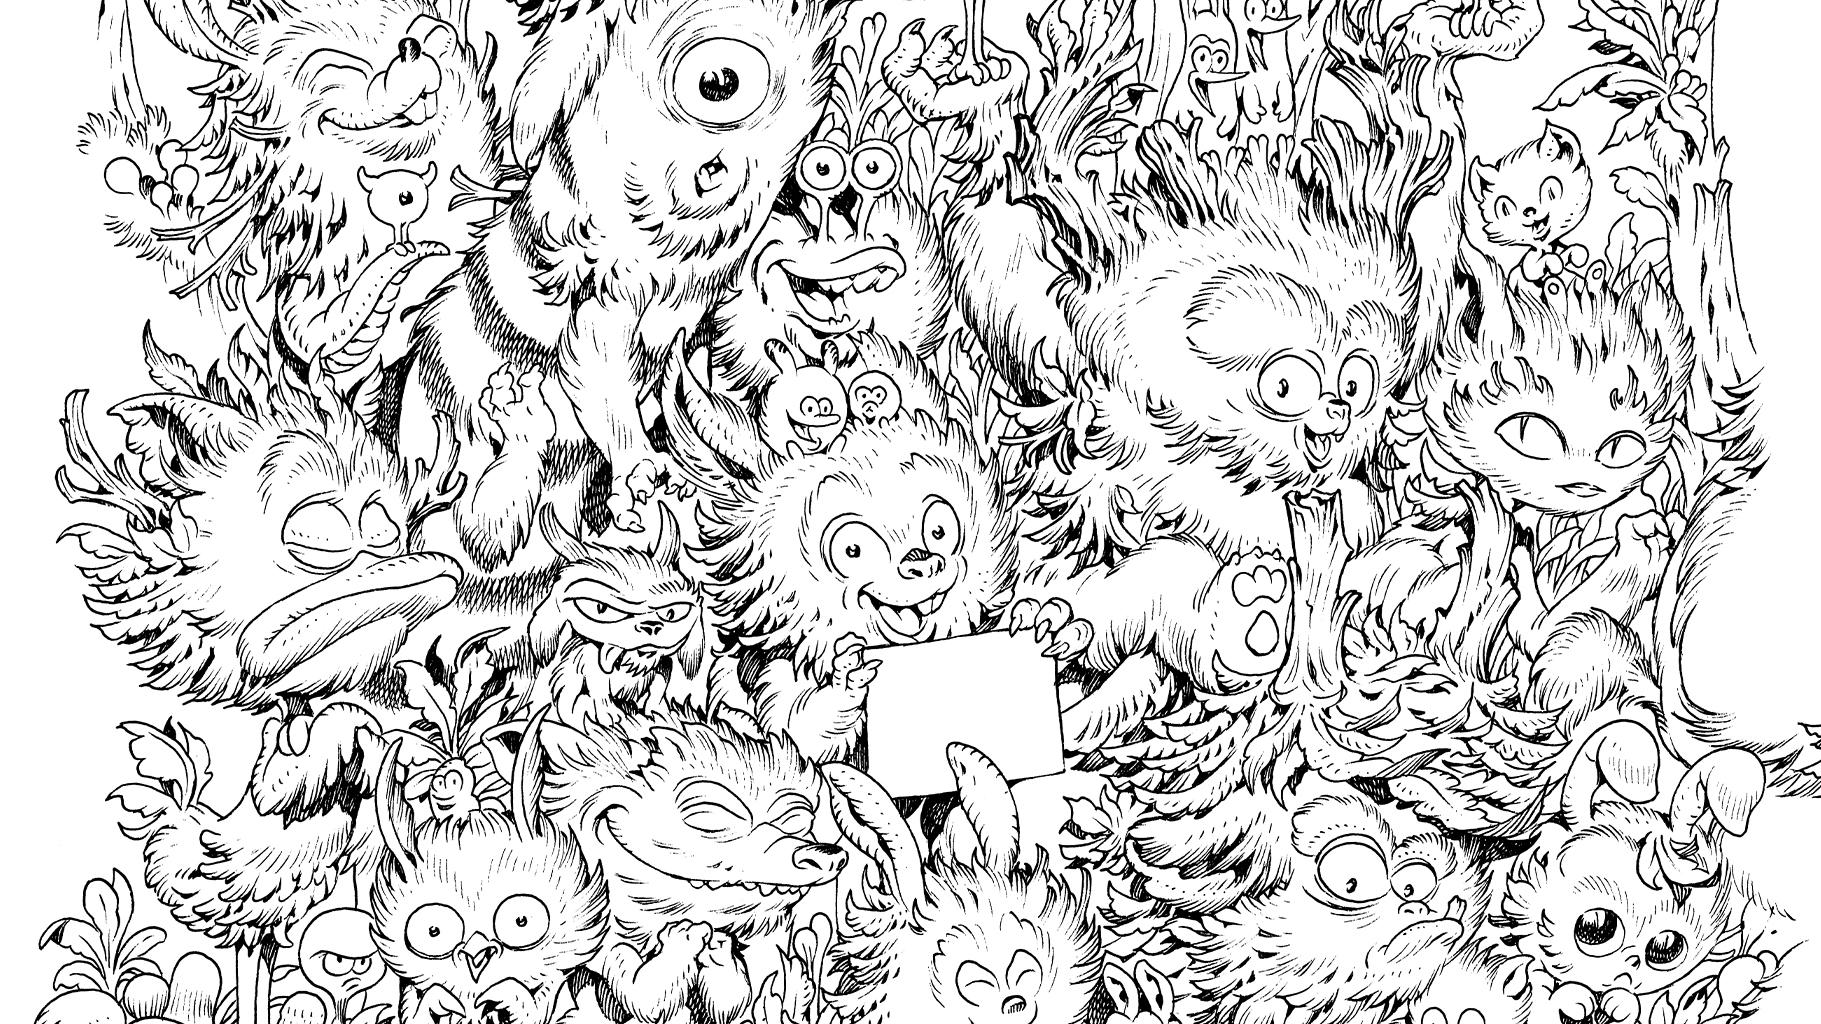 Grand Coloriage Zoo Monsters Festival Bd Aix En Provence